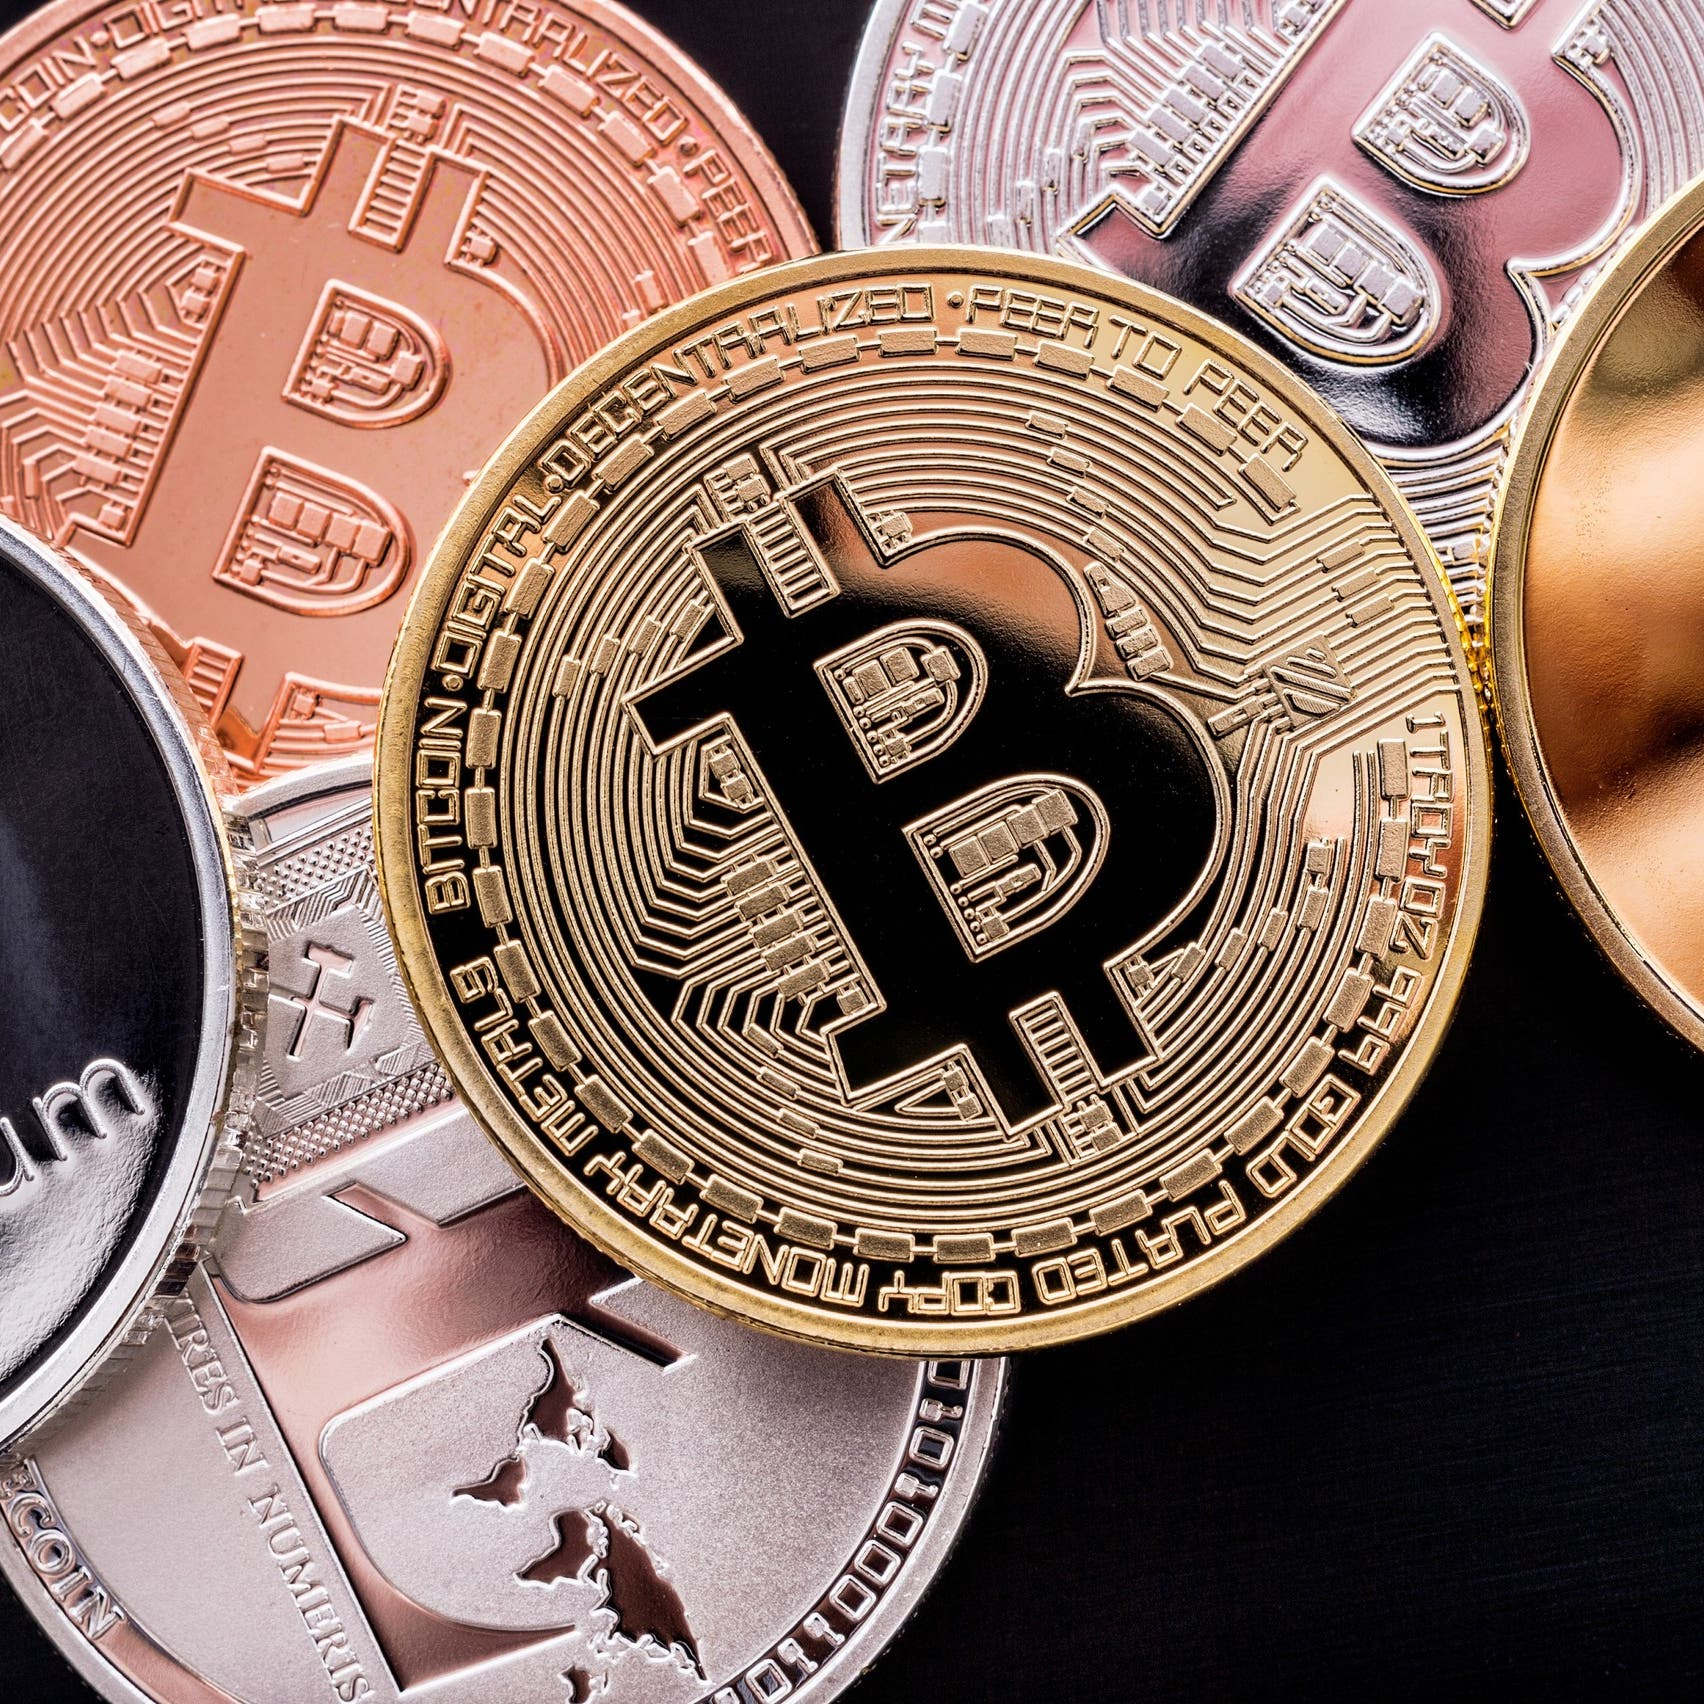 Coinbase تمهّد الطريق أمام شركات العملات المشفرة.. هل يتغيّر المشهد؟